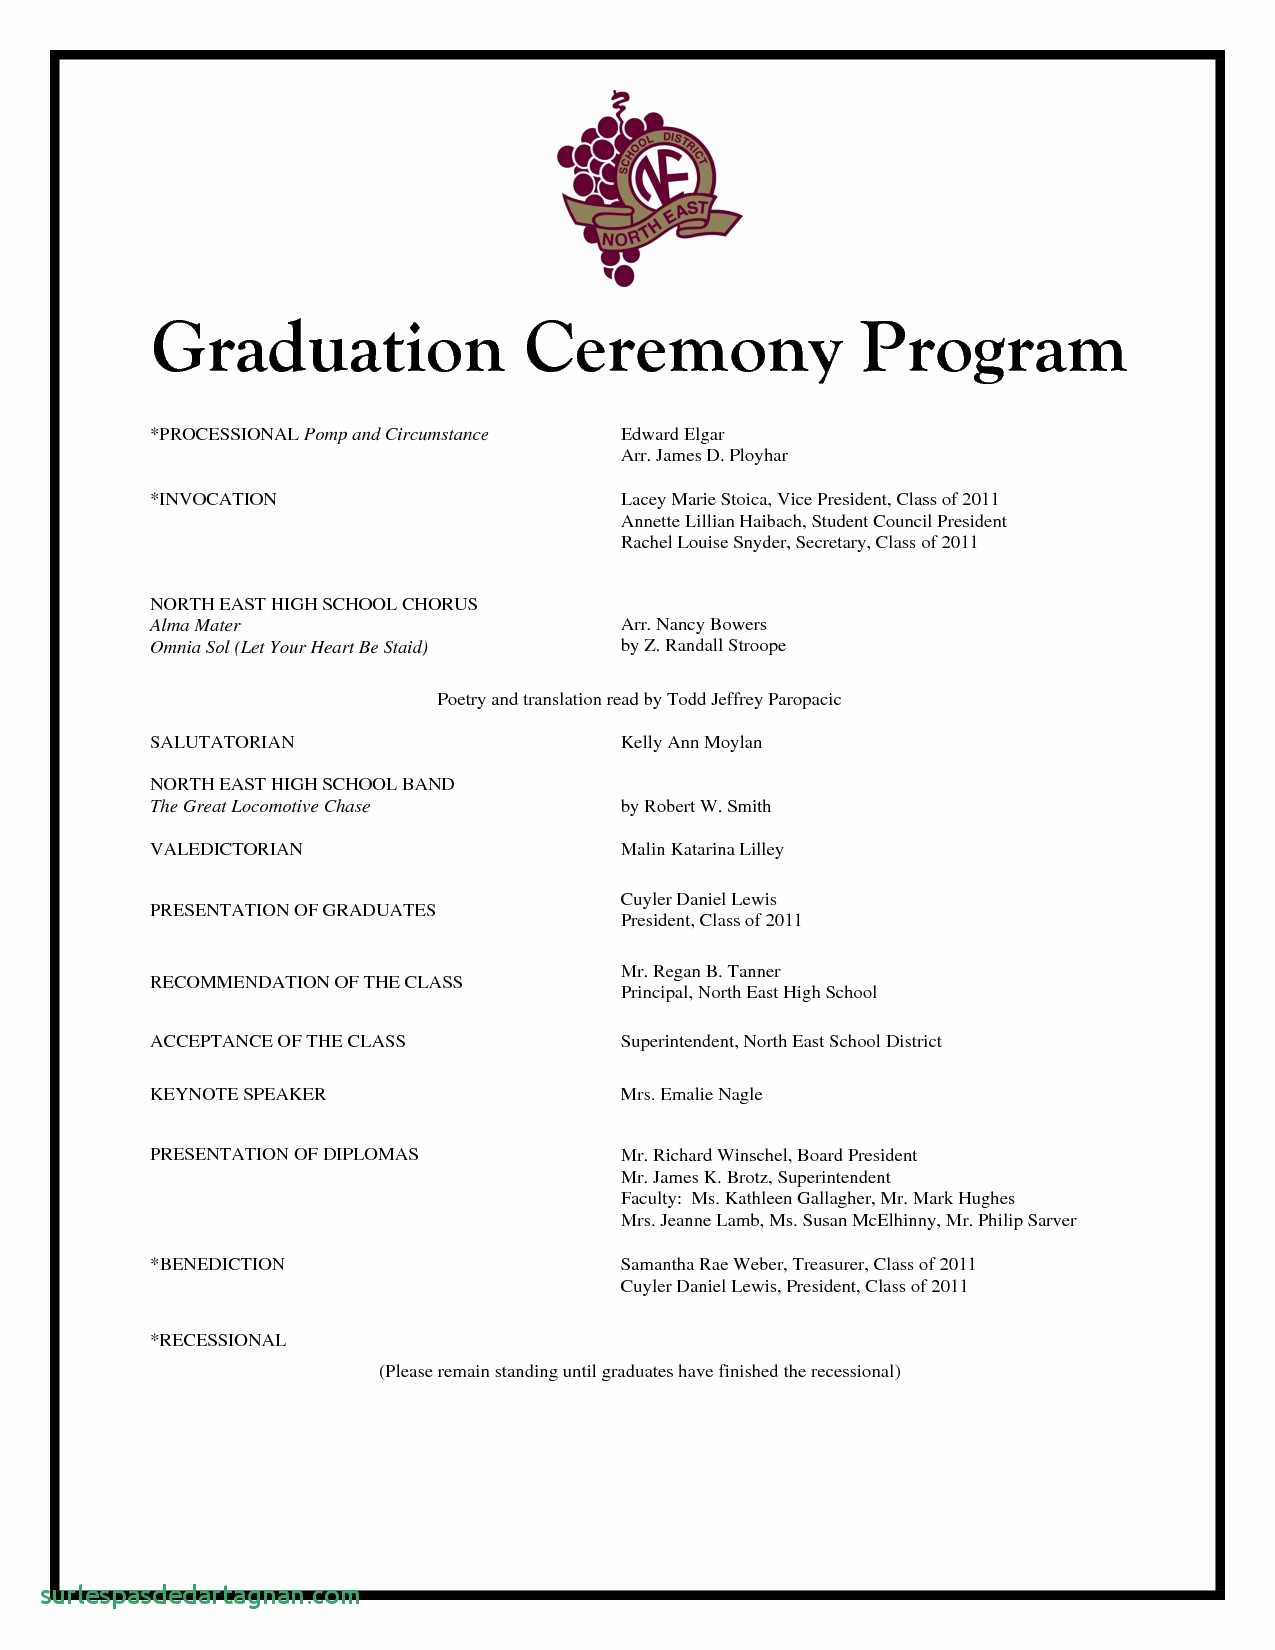 Preschool Graduation Program Template Elegant Preschool Graduation Programs Template Hashtag Bg